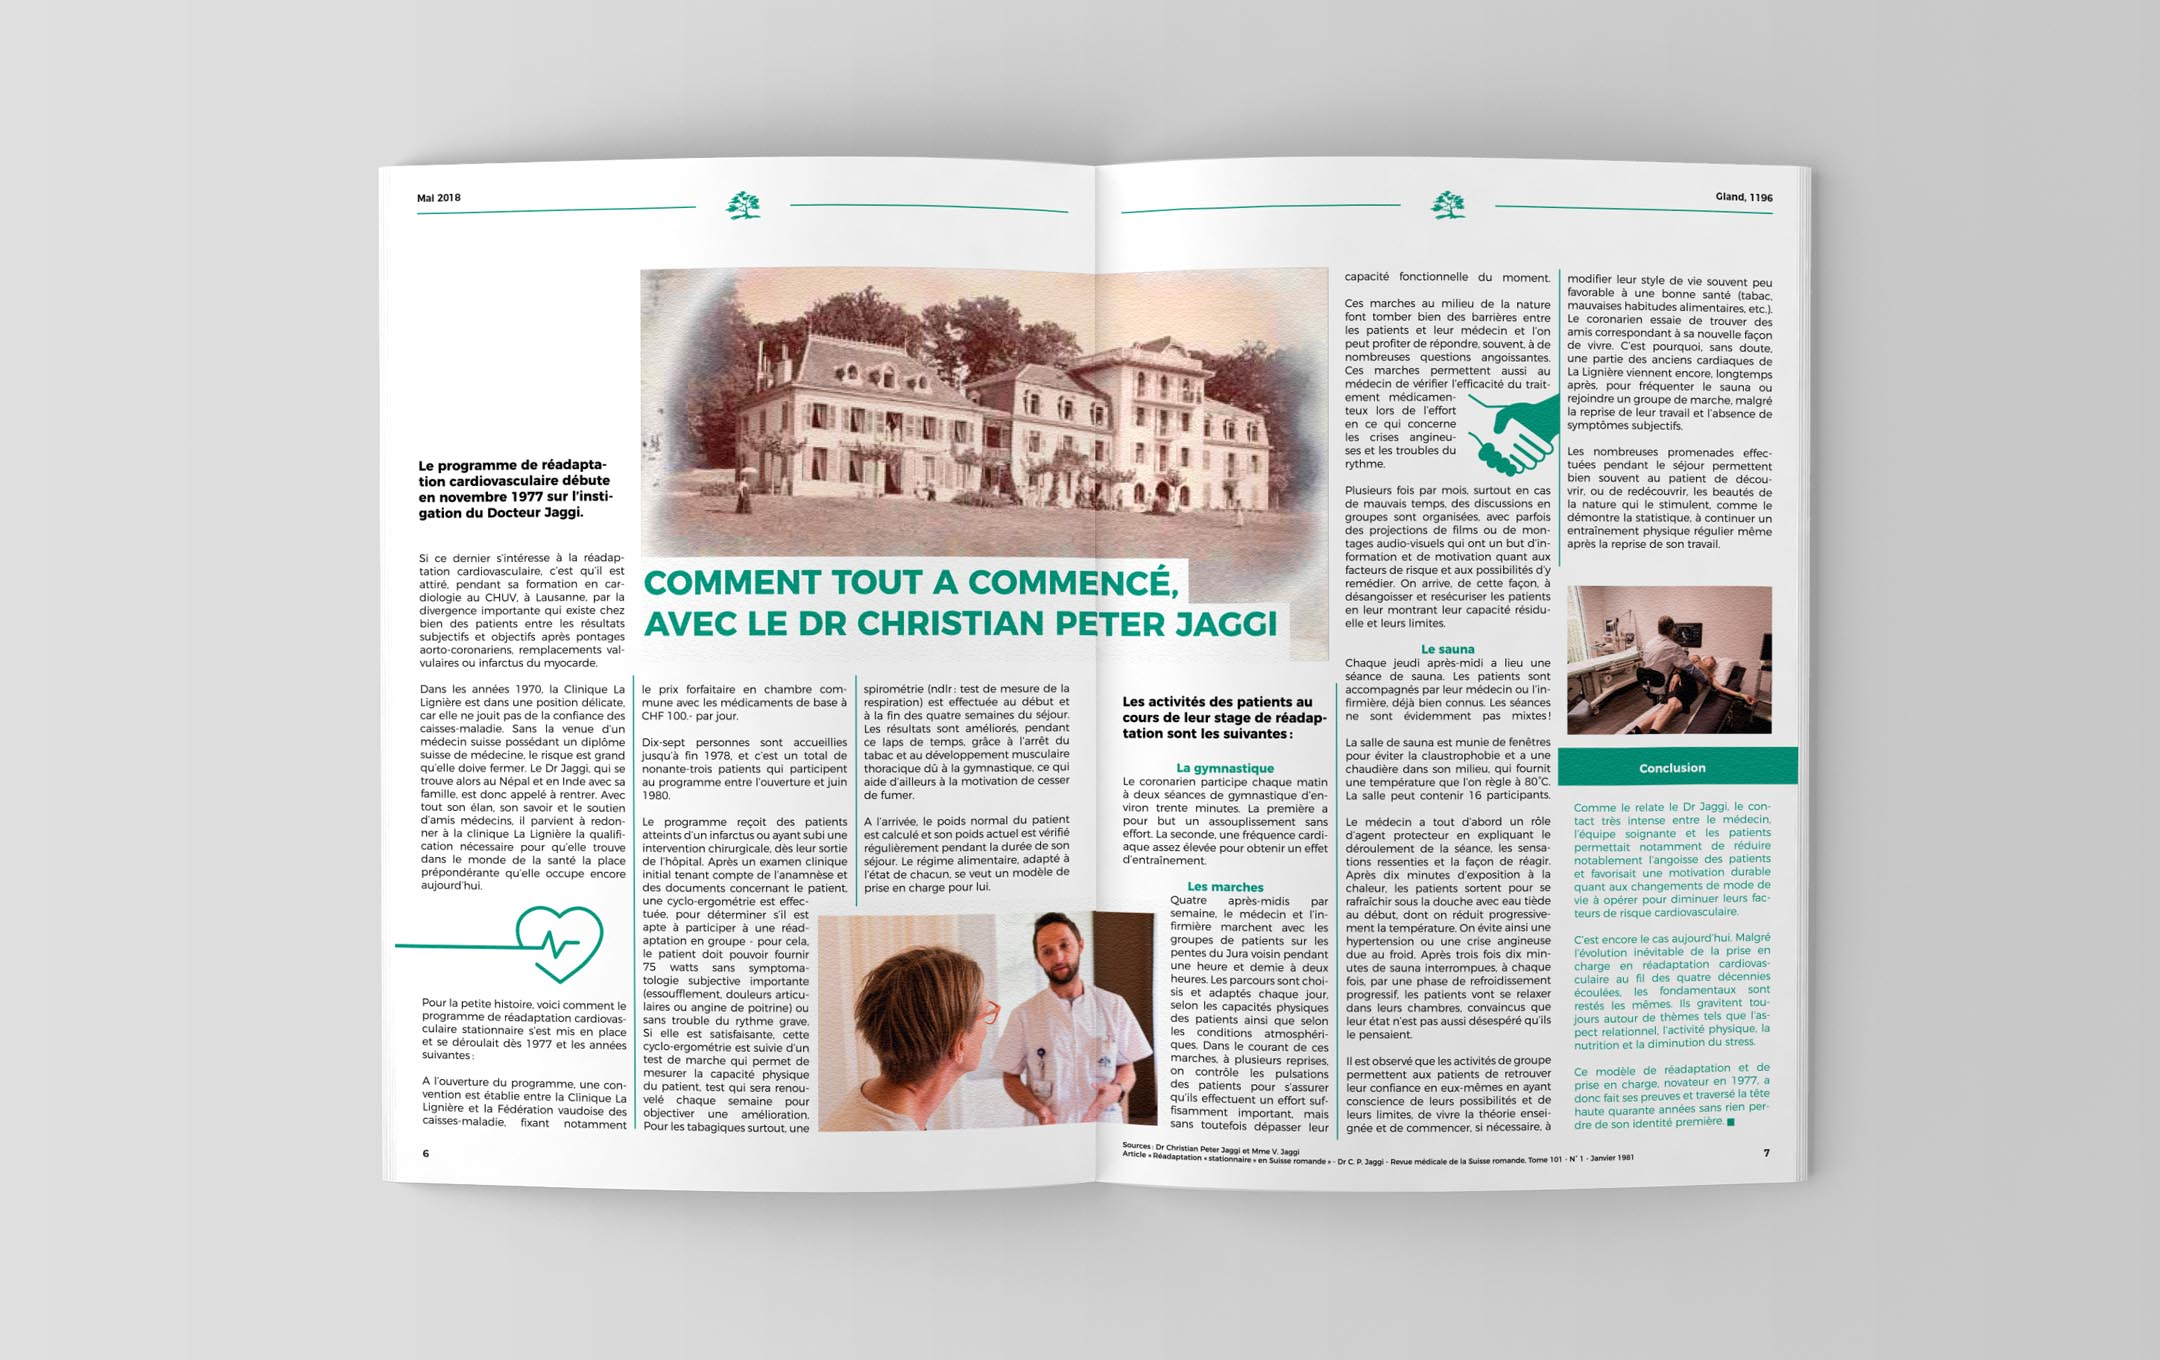 Habefast Etude De Cas La Ligniere Journal